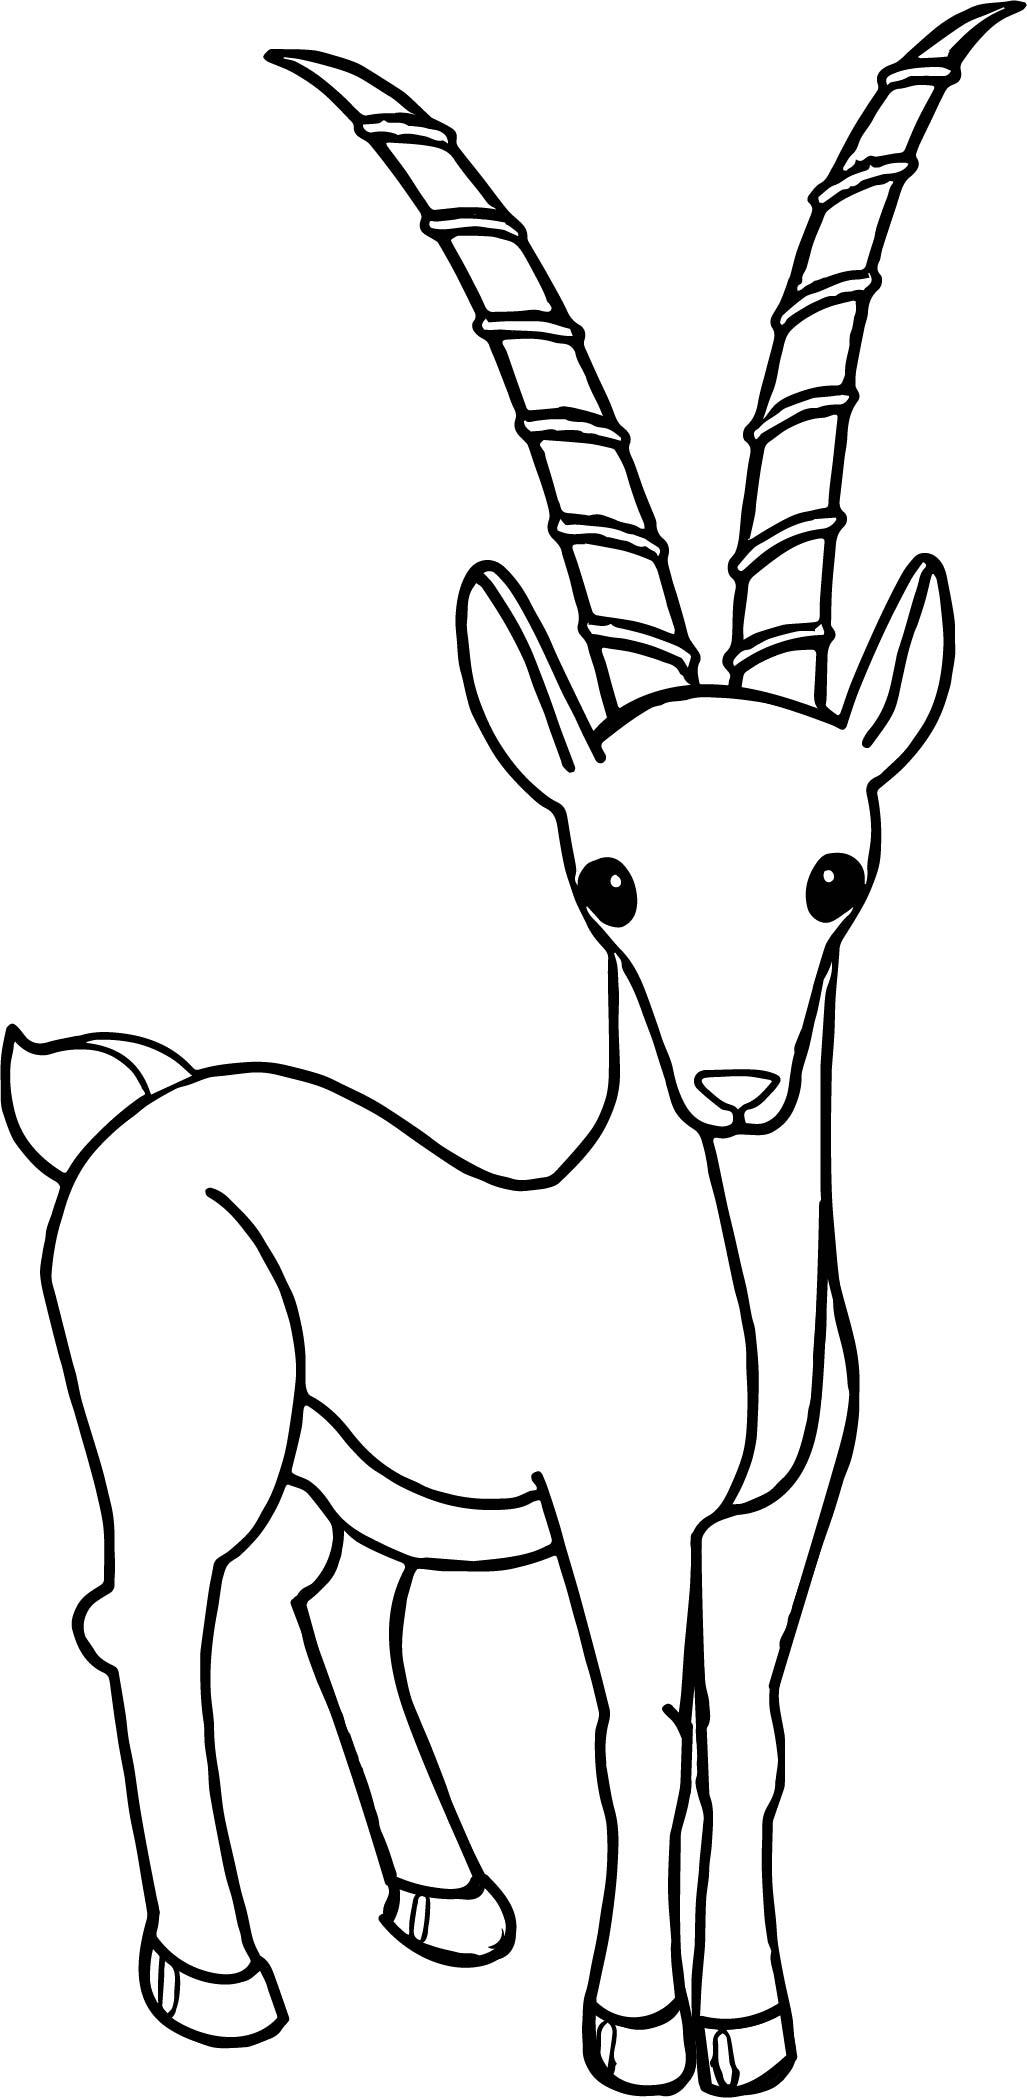 cartoon antelope cartoon antelopes coloring pages free coloring pages antelope cartoon